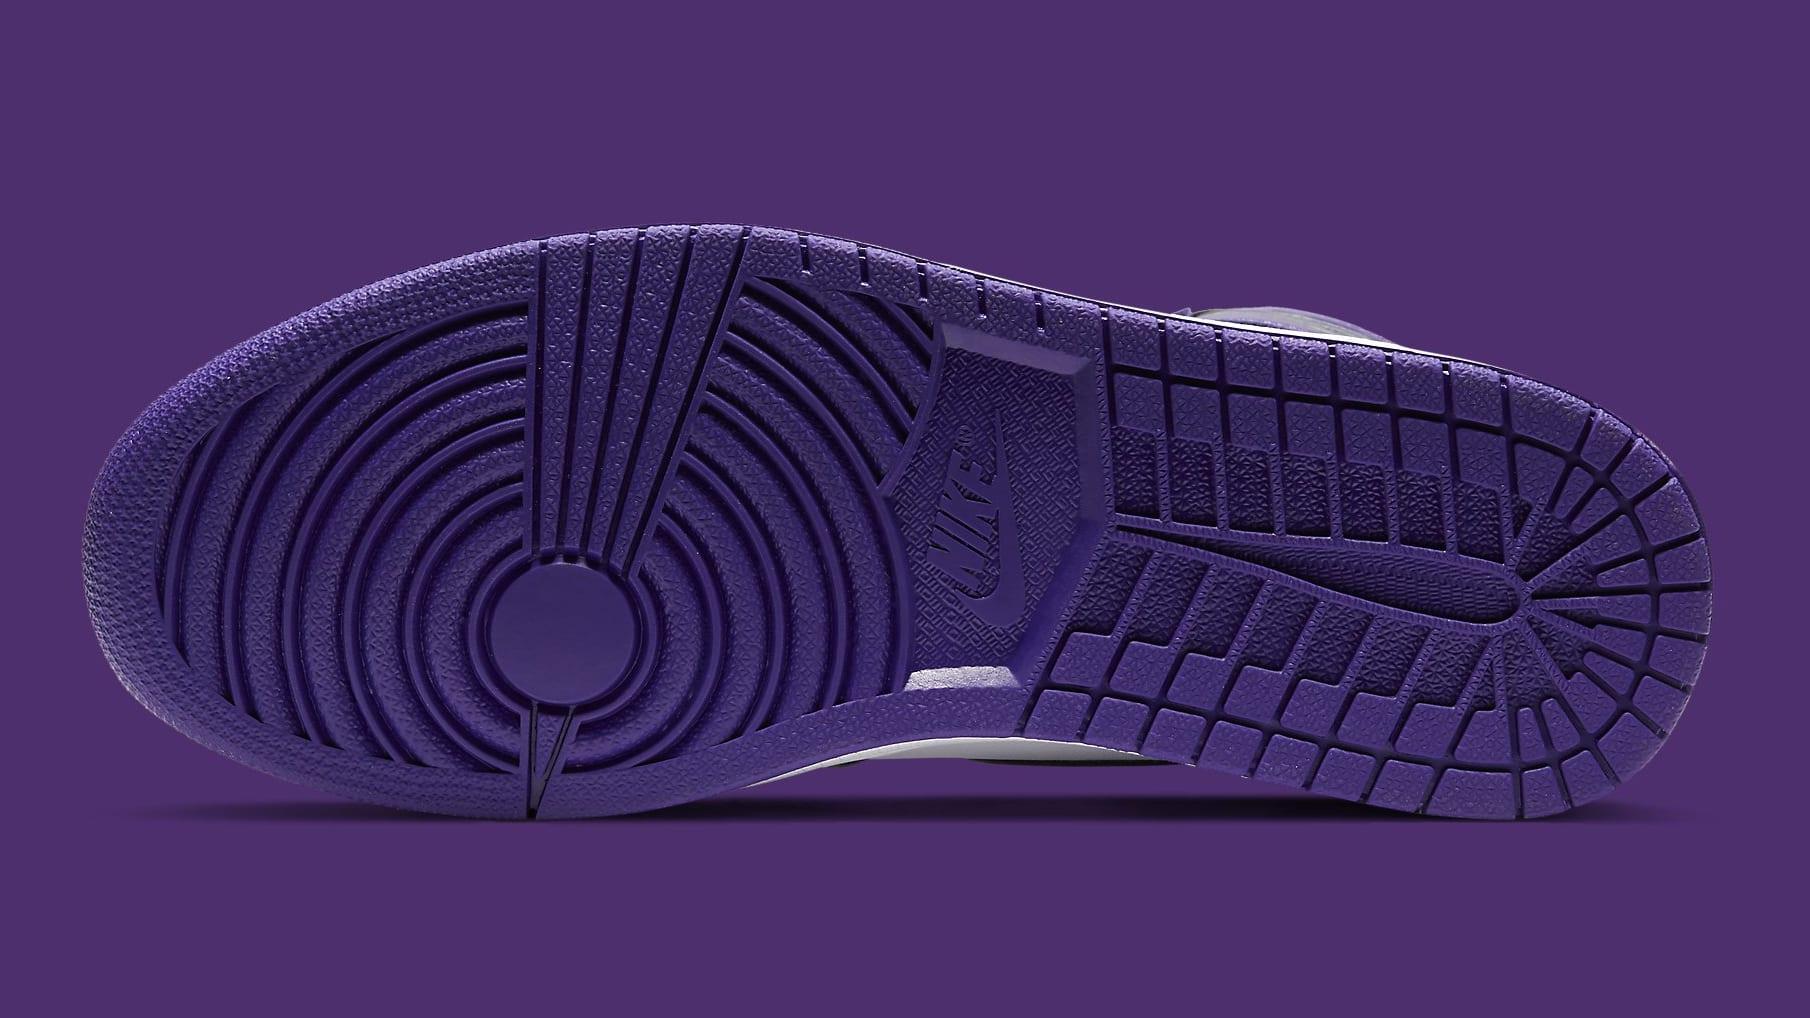 Air Jordan 1 Court Purple Release Date 555088-500 Sole